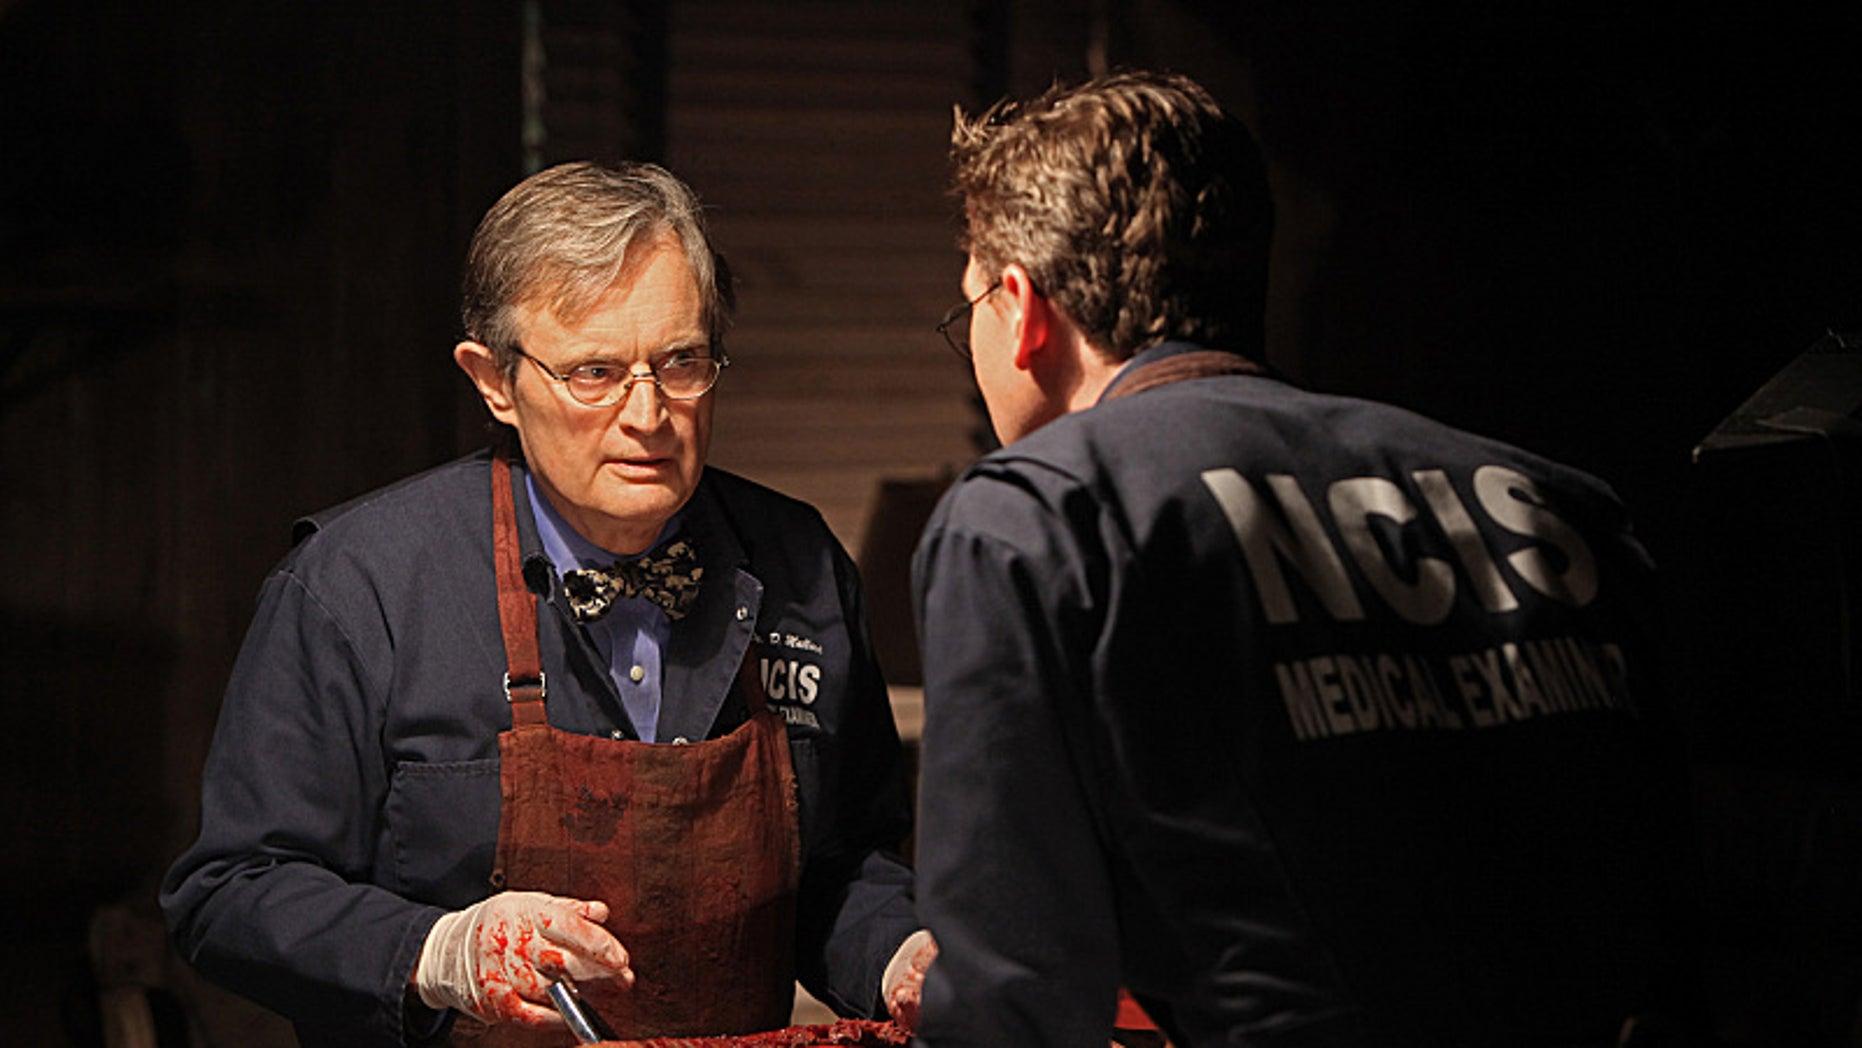 David McCallum as Ducky on 'NCIS' (CBS)